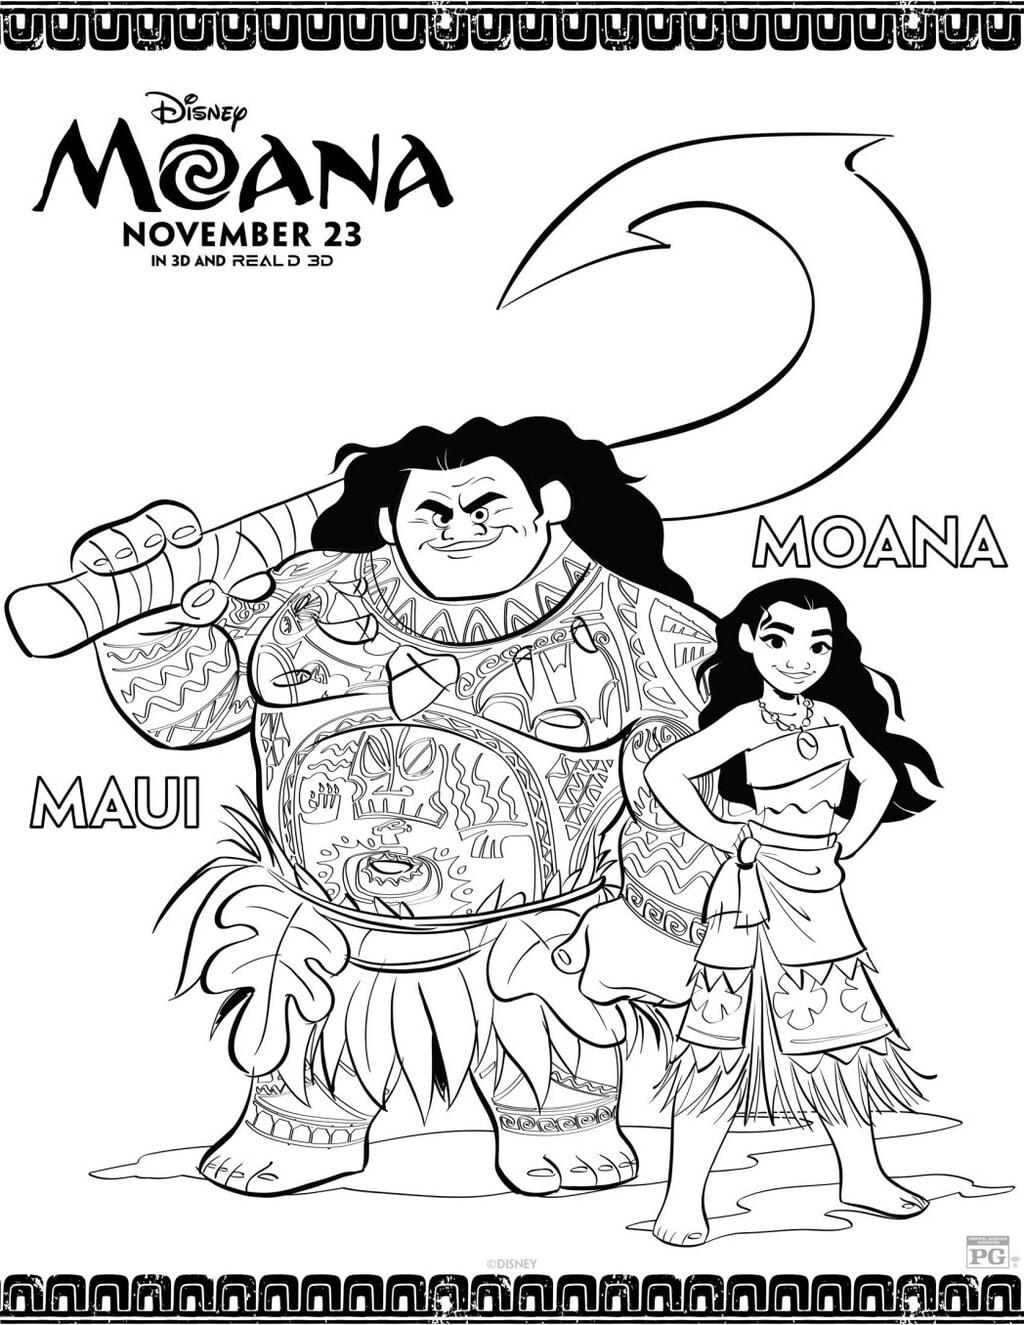 Moana Coloring Sheet with Moana and Maui